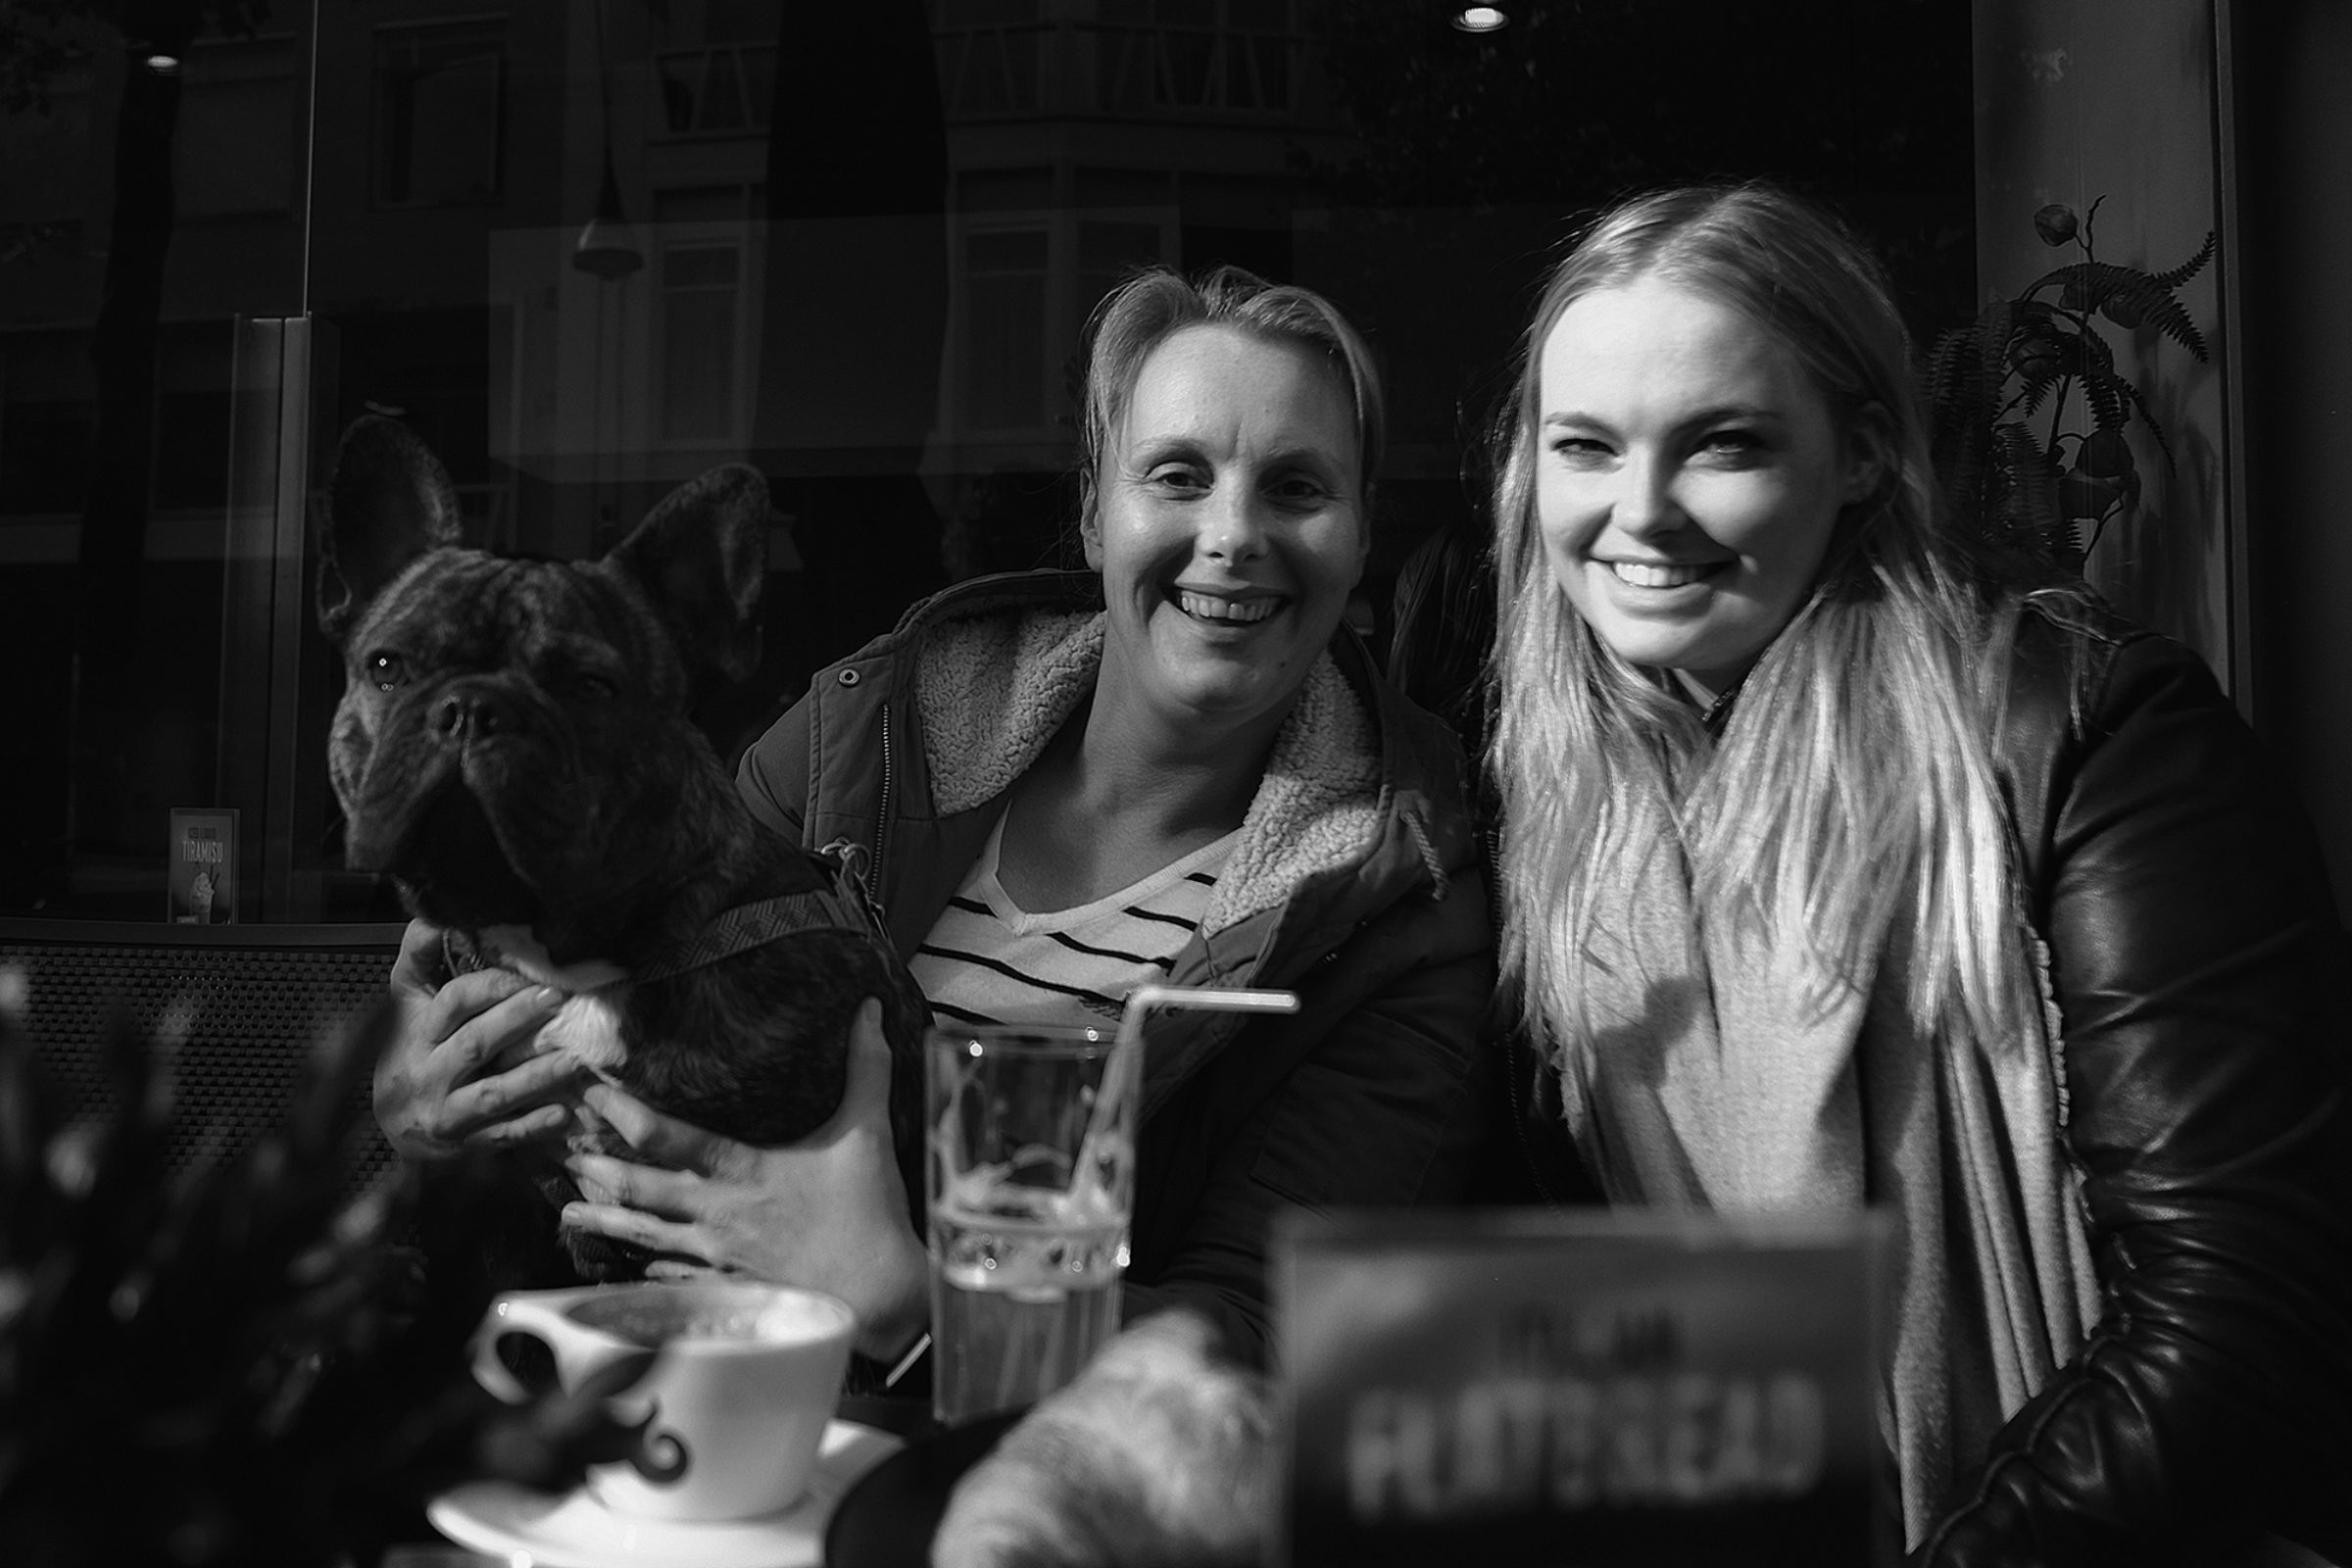 de mensen van Enschede - Anouk en Elise